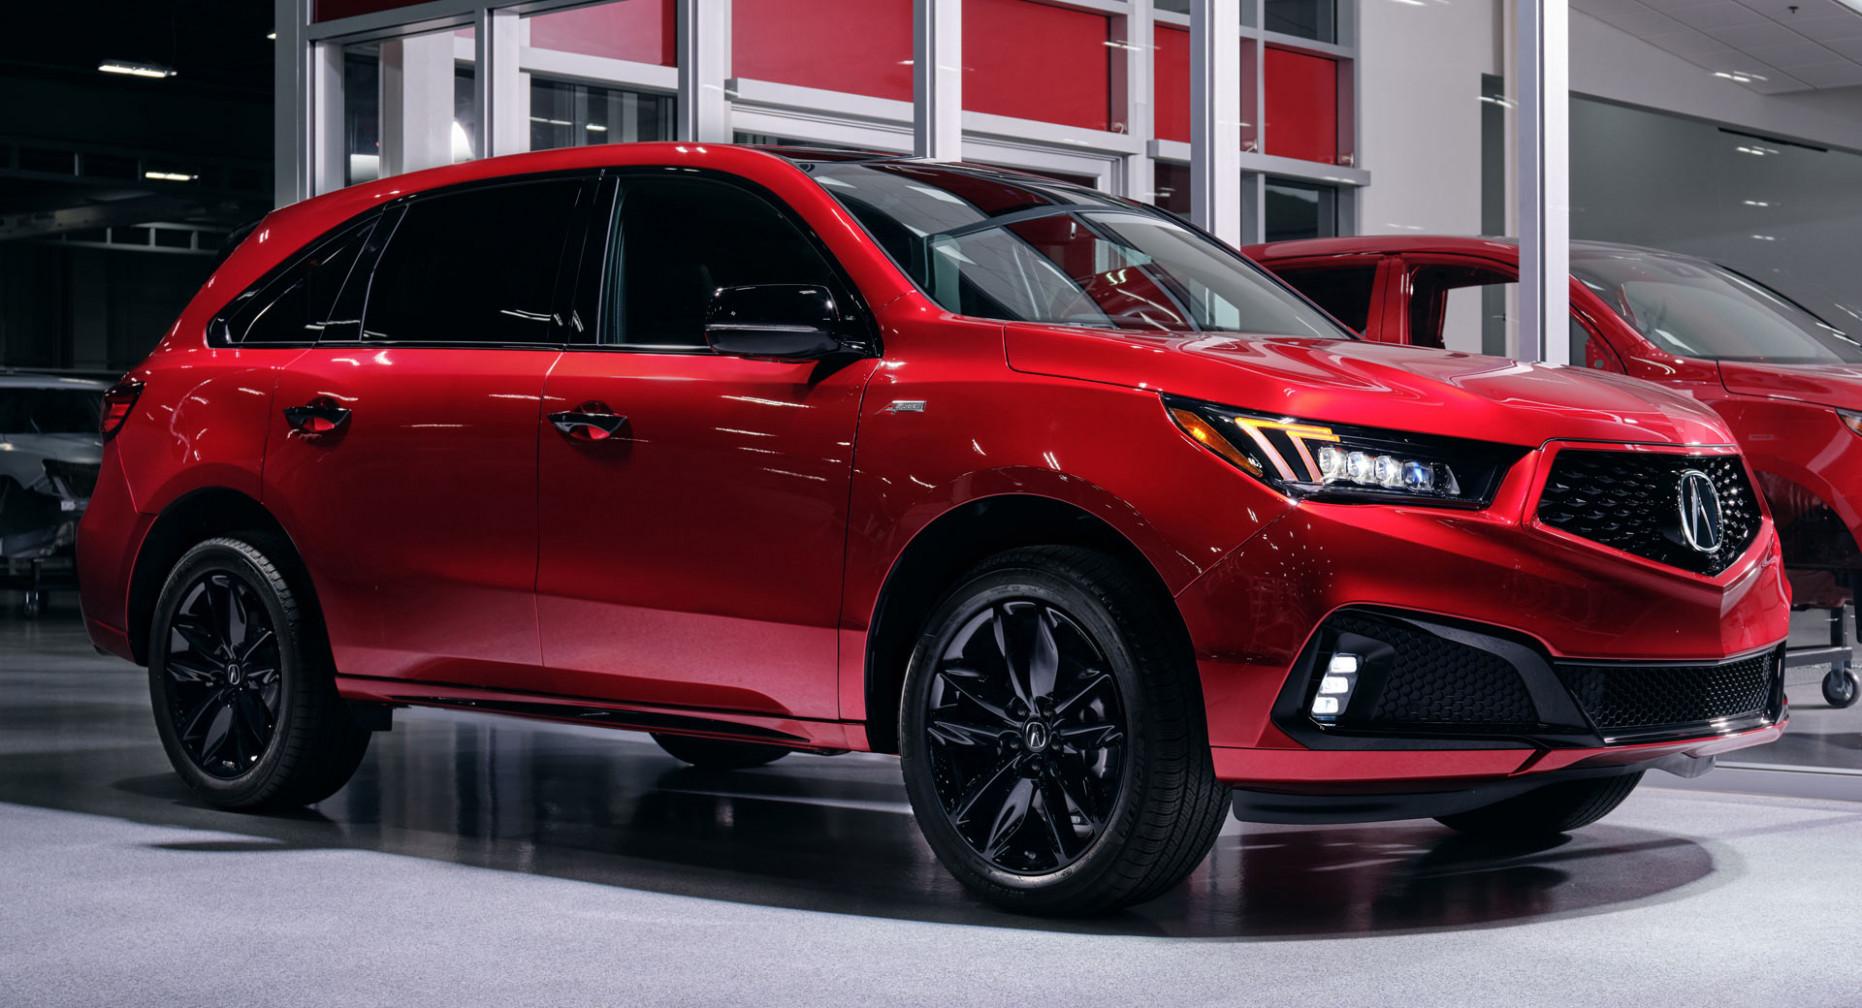 New Concept 2022 Acura Mdx Pmc